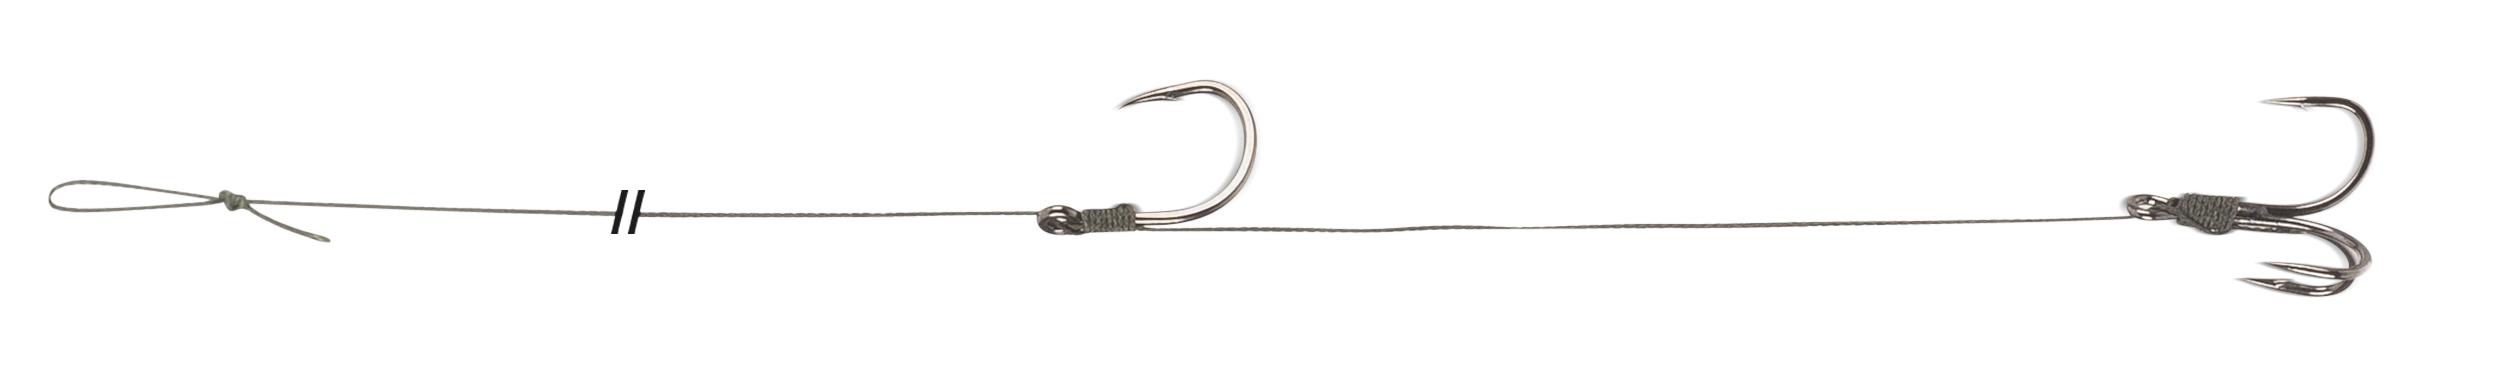 Návazec Uni Cat Single/Treble Hook Rig Nosnost 85 kg